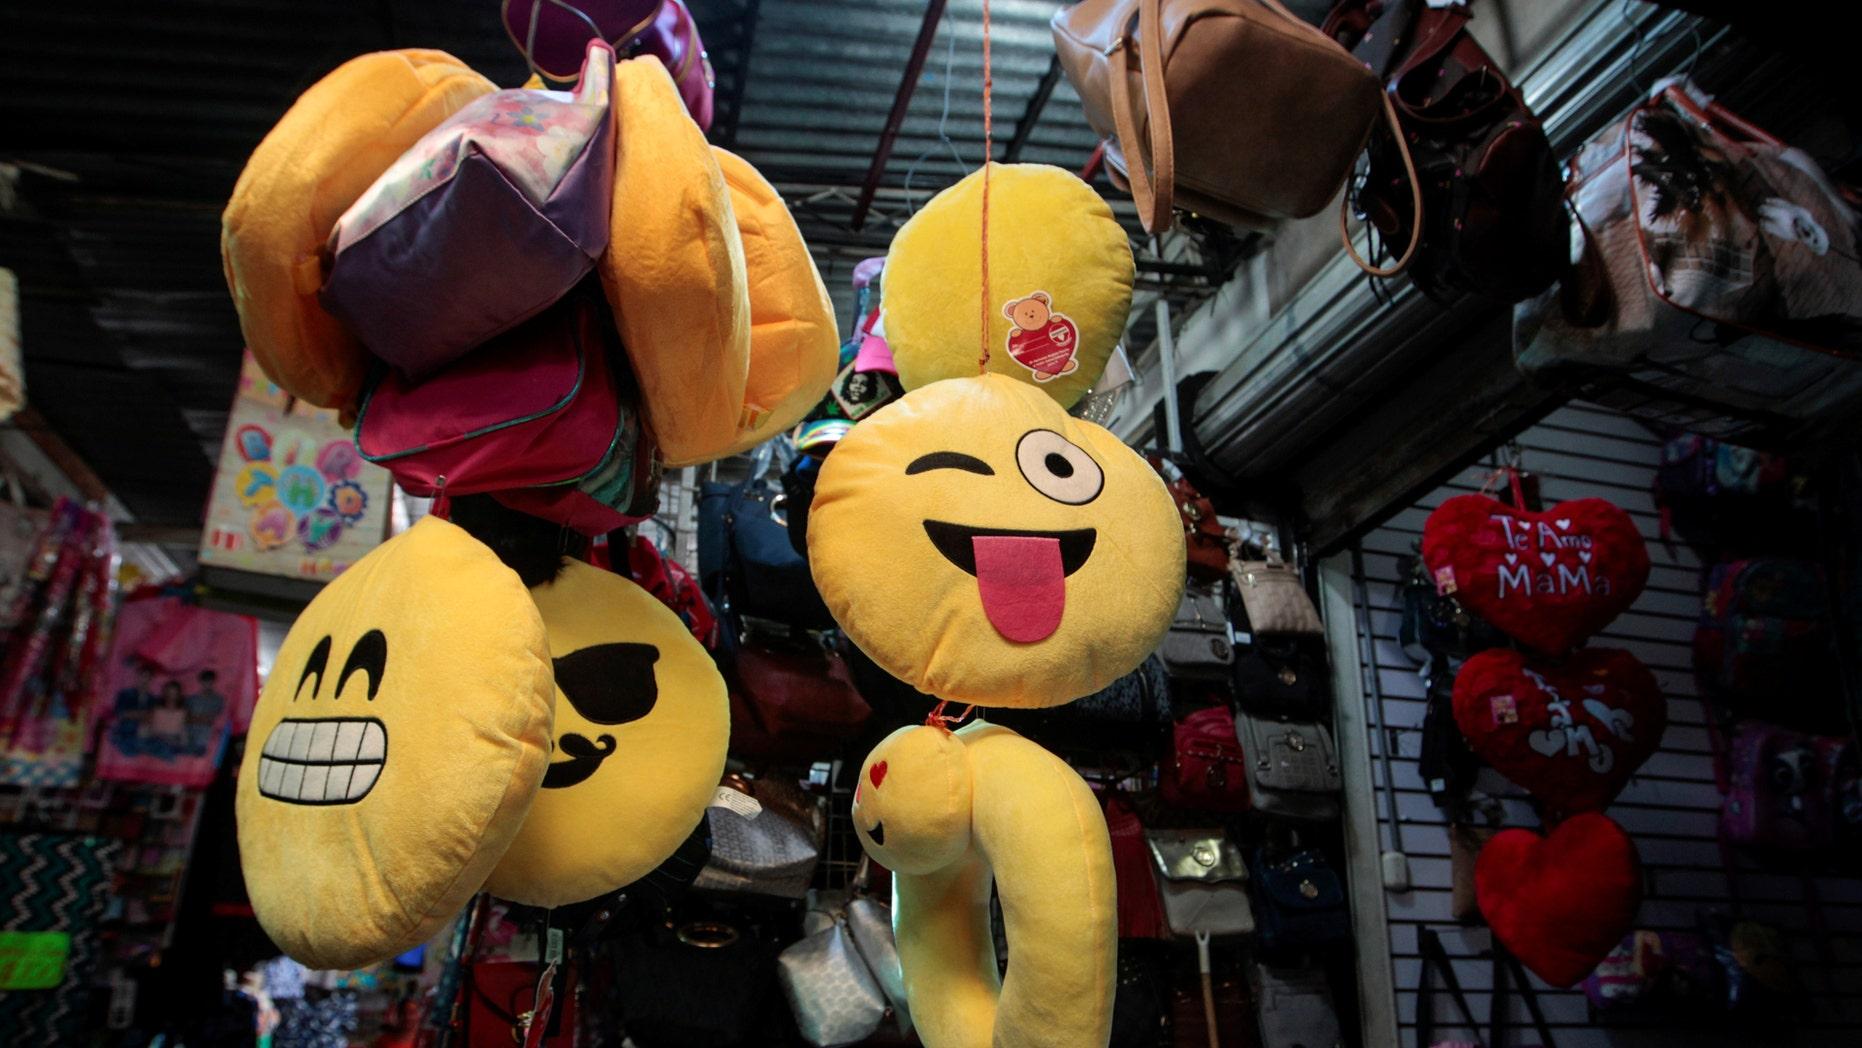 File photo: A woman sells emoji cushions at the Oriental market in Managua, Nicaragua, May 19,2017. (REUTERS/Oswaldo Rivas)